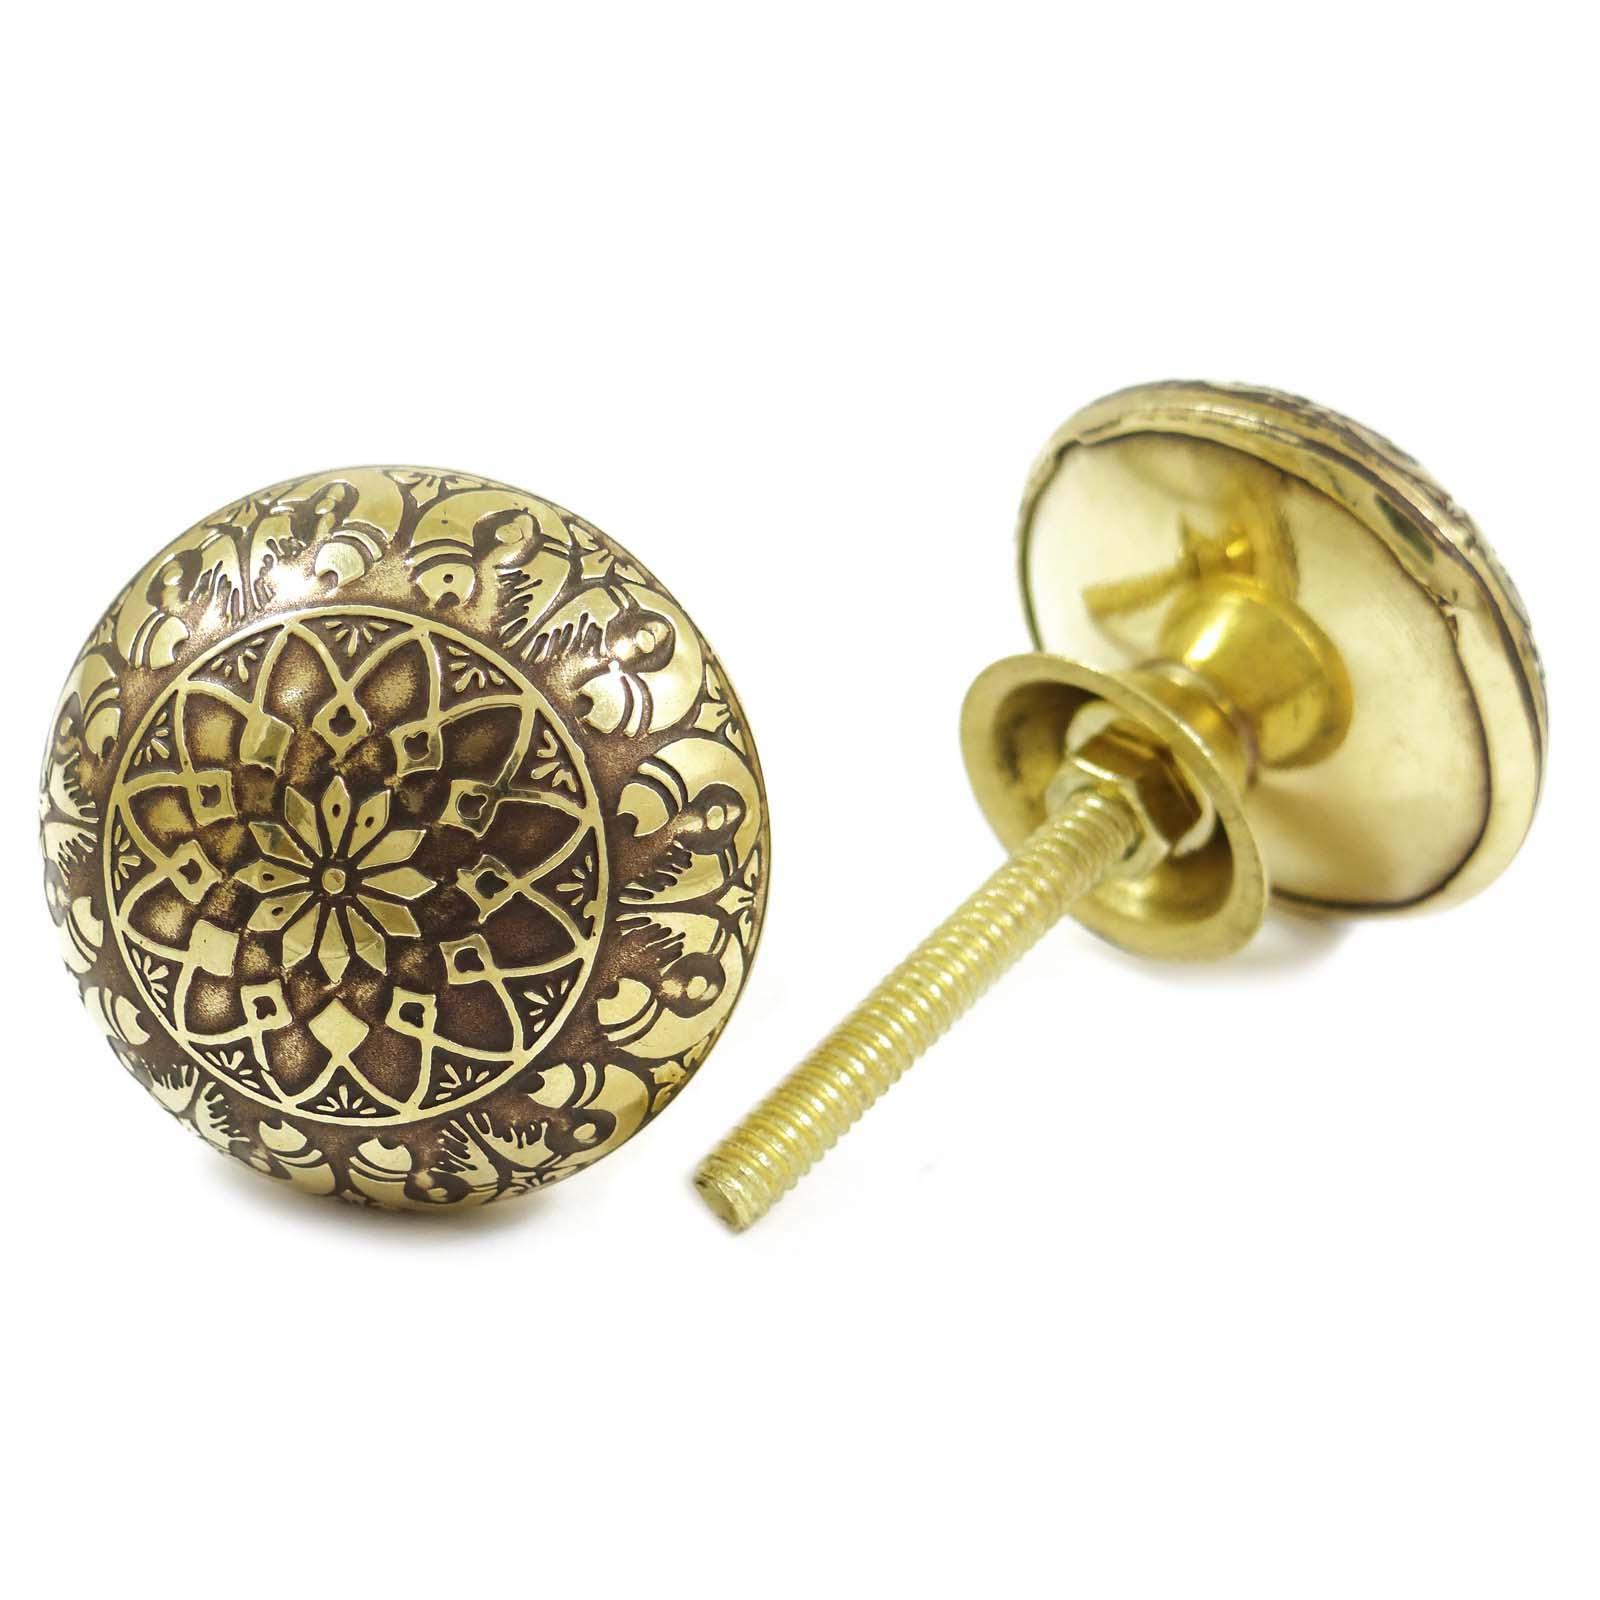 closet door knobs decorative photo - 6